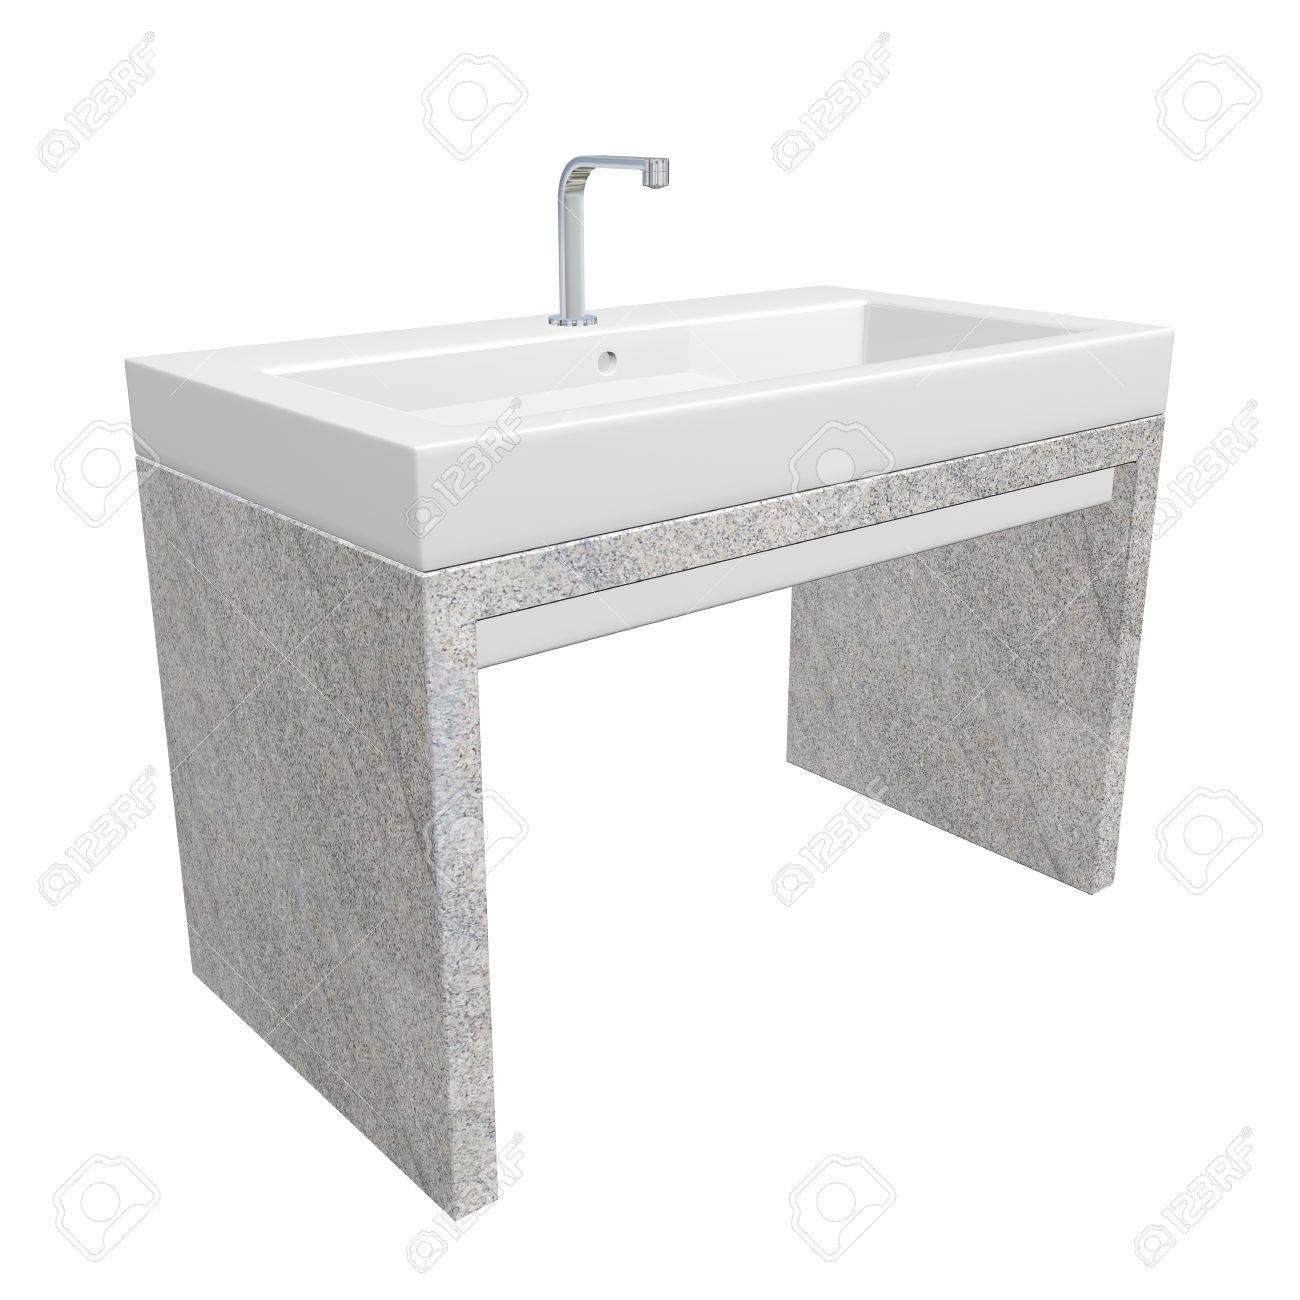 Modern Washroom Sink Set With Ceramic Or Acrylic Wash Basin, Chrome  Fixtures, And Granite